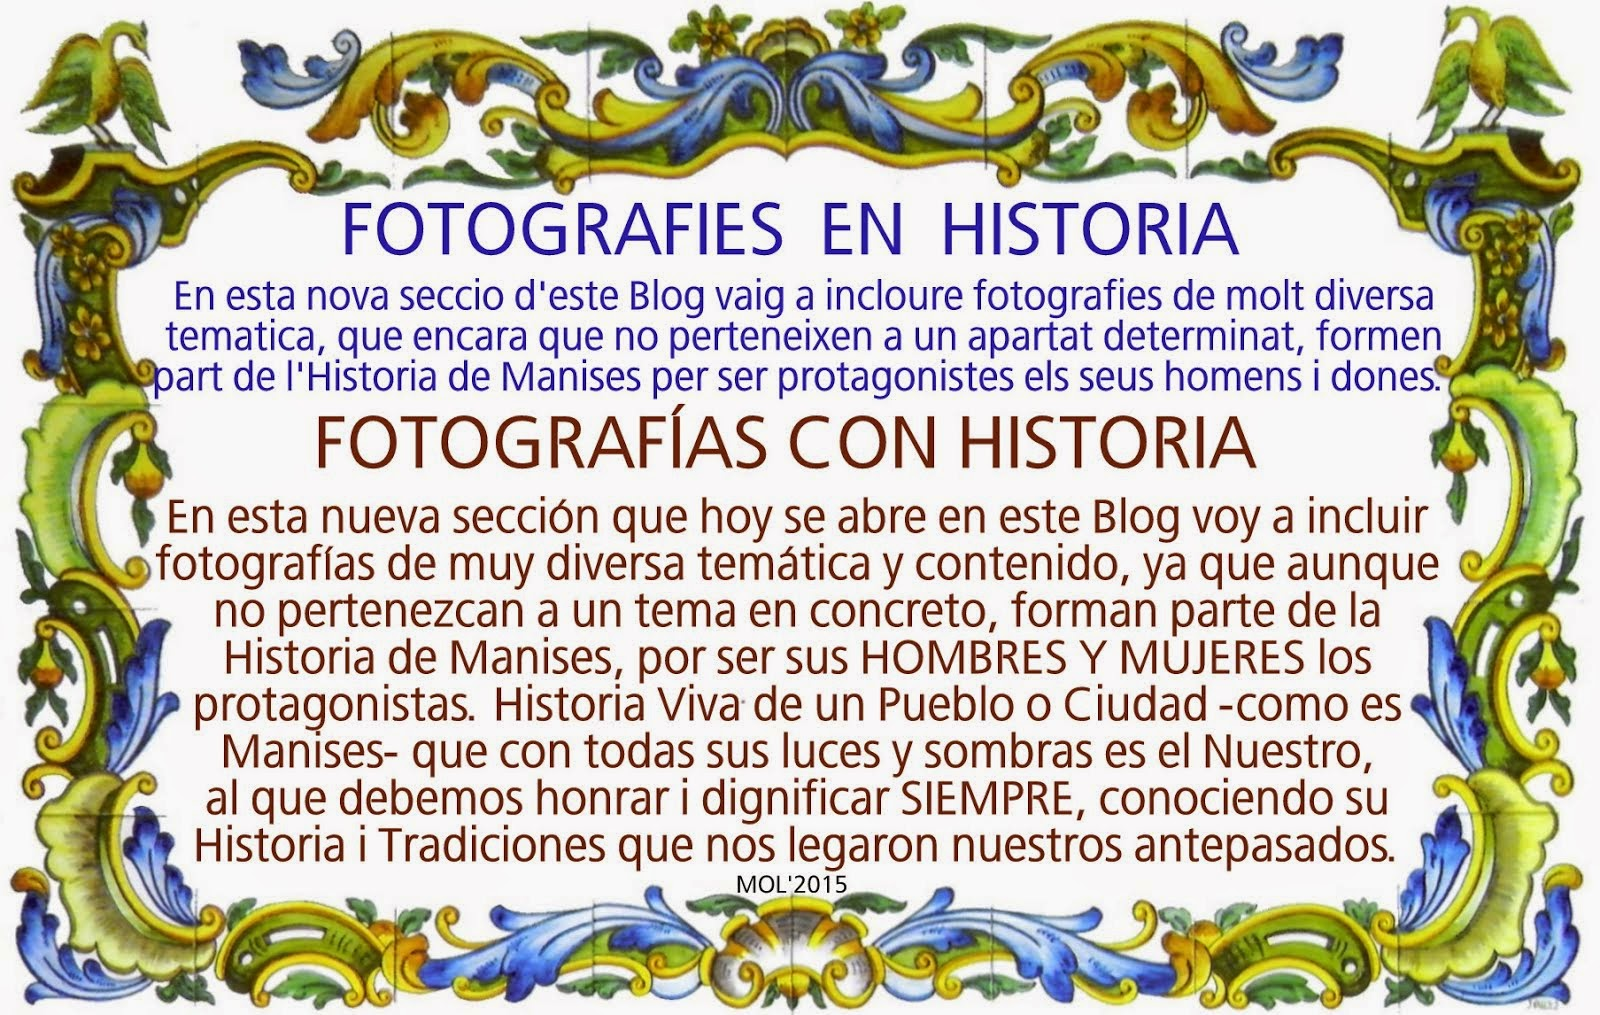 HISTORIA VIVA DE MANISES